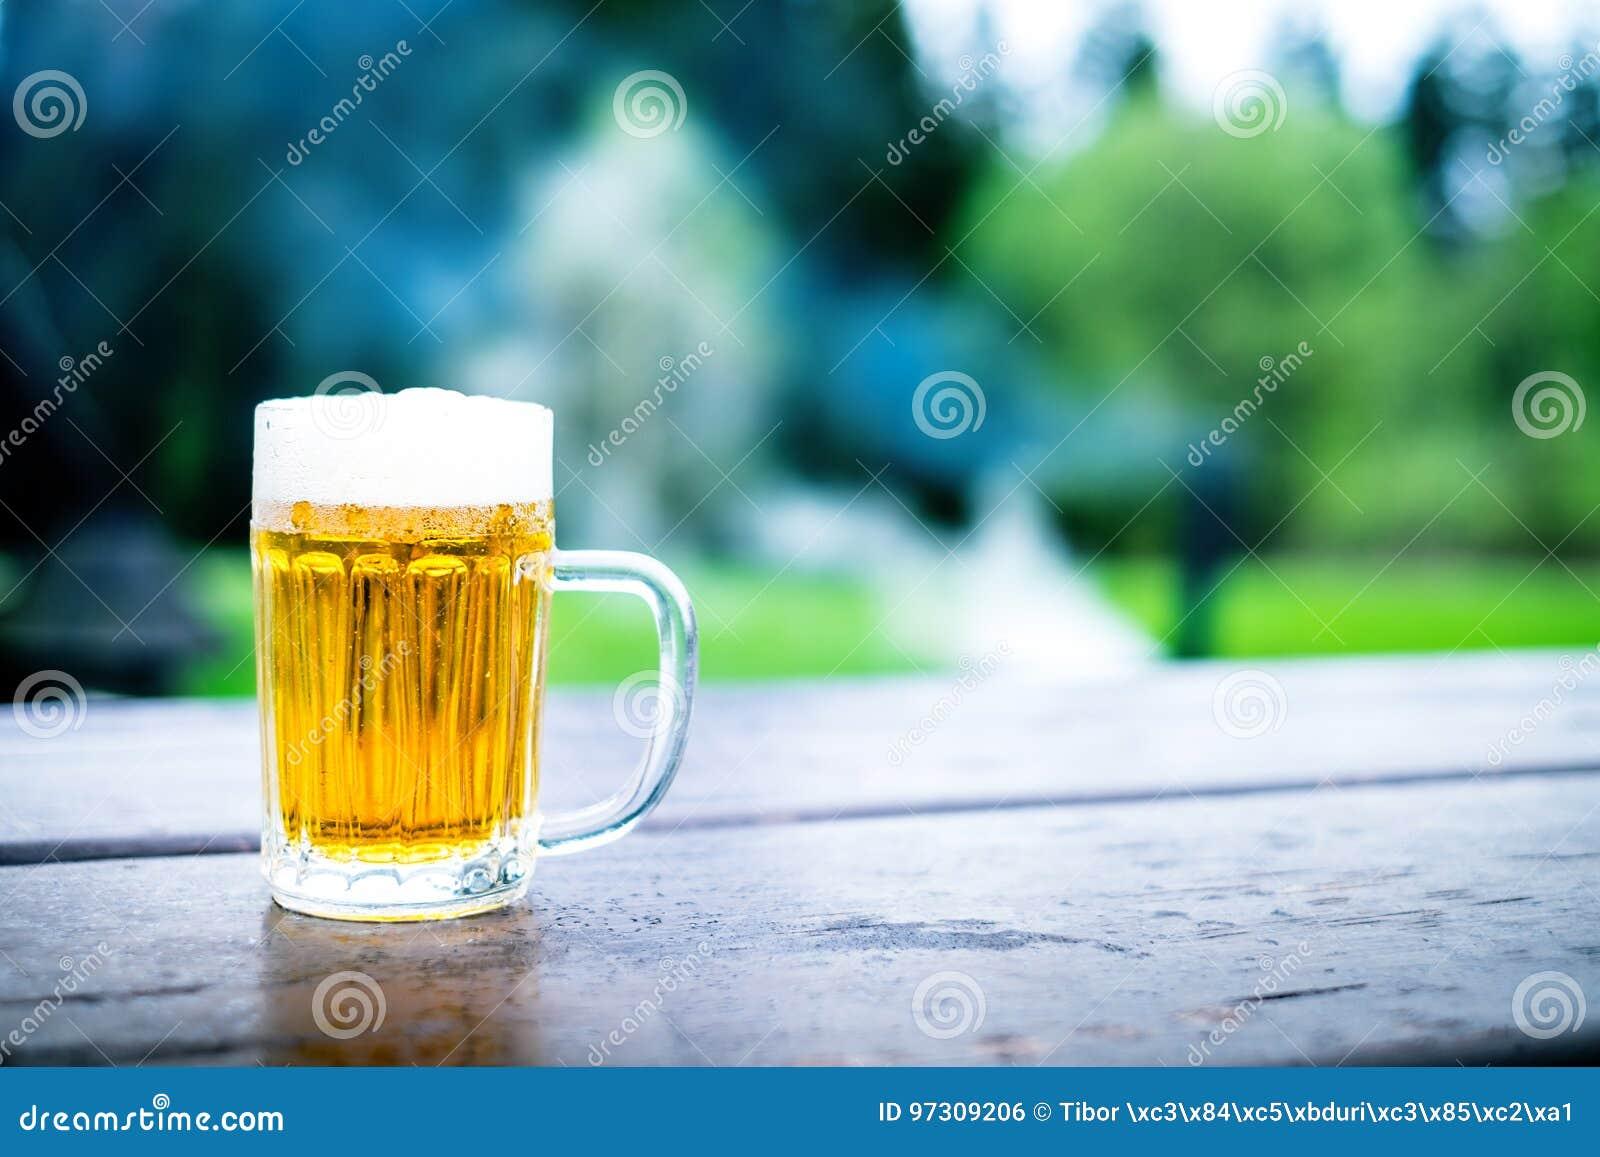 Vidrio de cerveza ligera con espuma en una tabla de madera Fiesta de jardín Fondo natural Alcohol Cerveza de barril